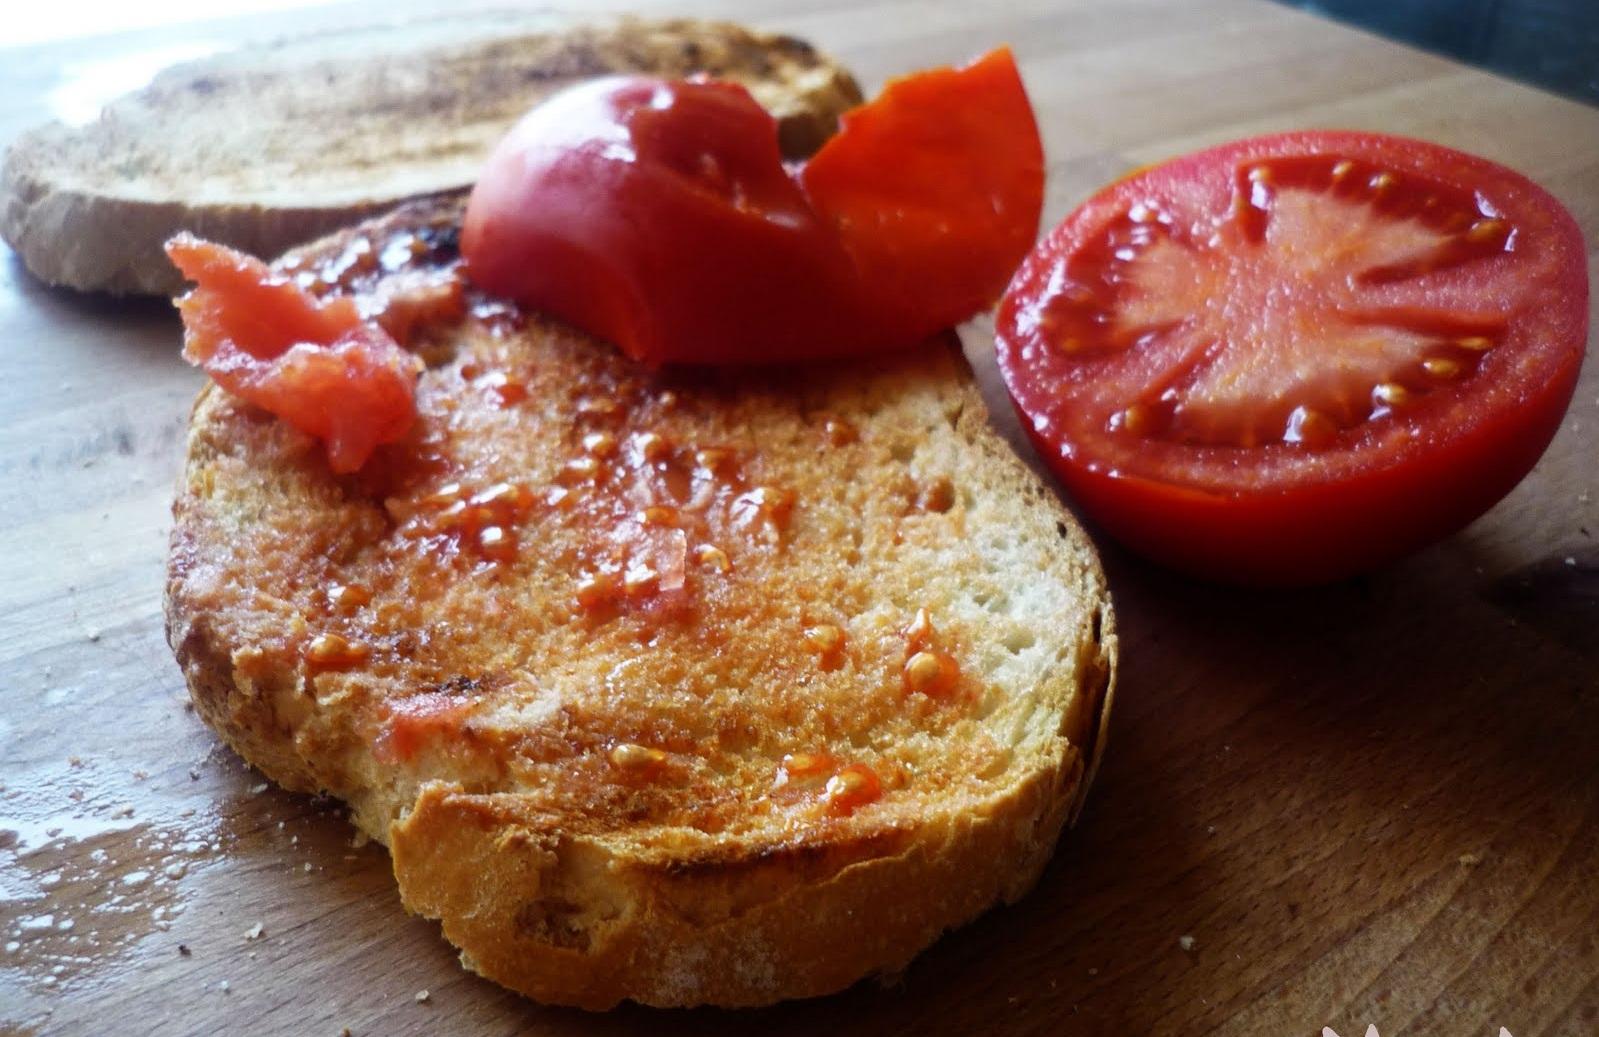 pan tumaca or pan con tomate